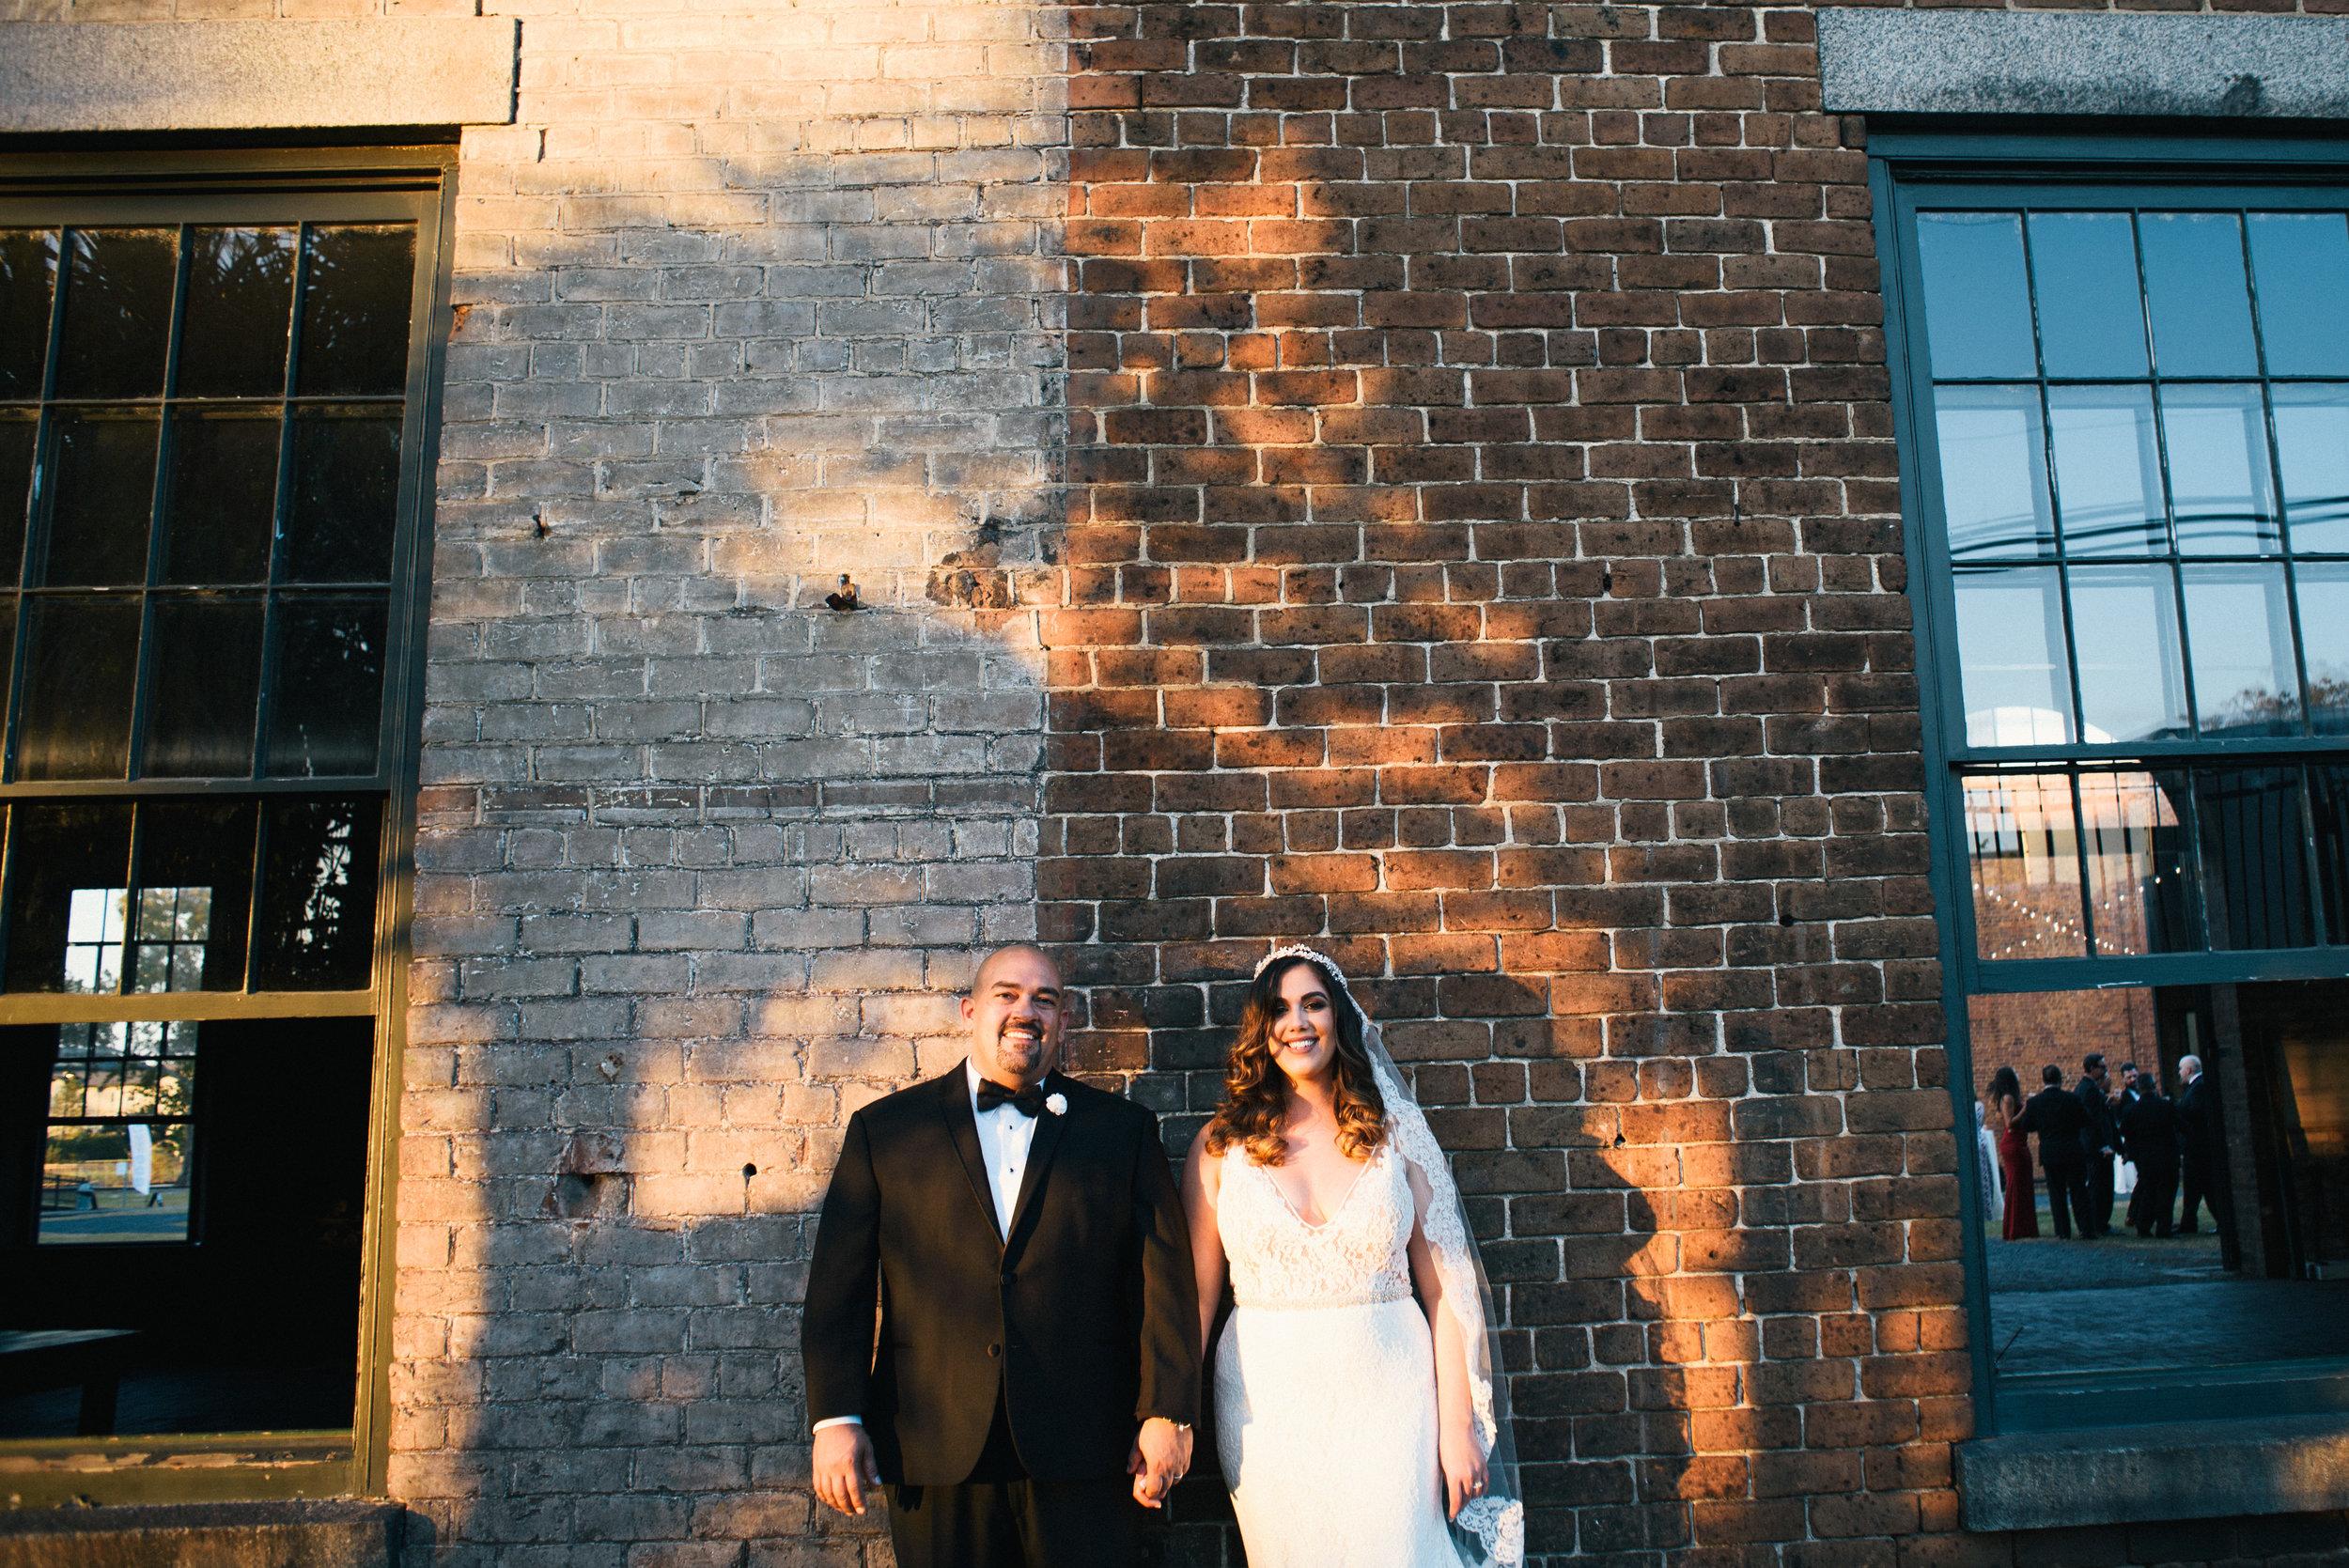 Iggy-and-yesenia-savannah-railroad-museum-wedding-meg-hill-photo- (676 of 1037).jpg